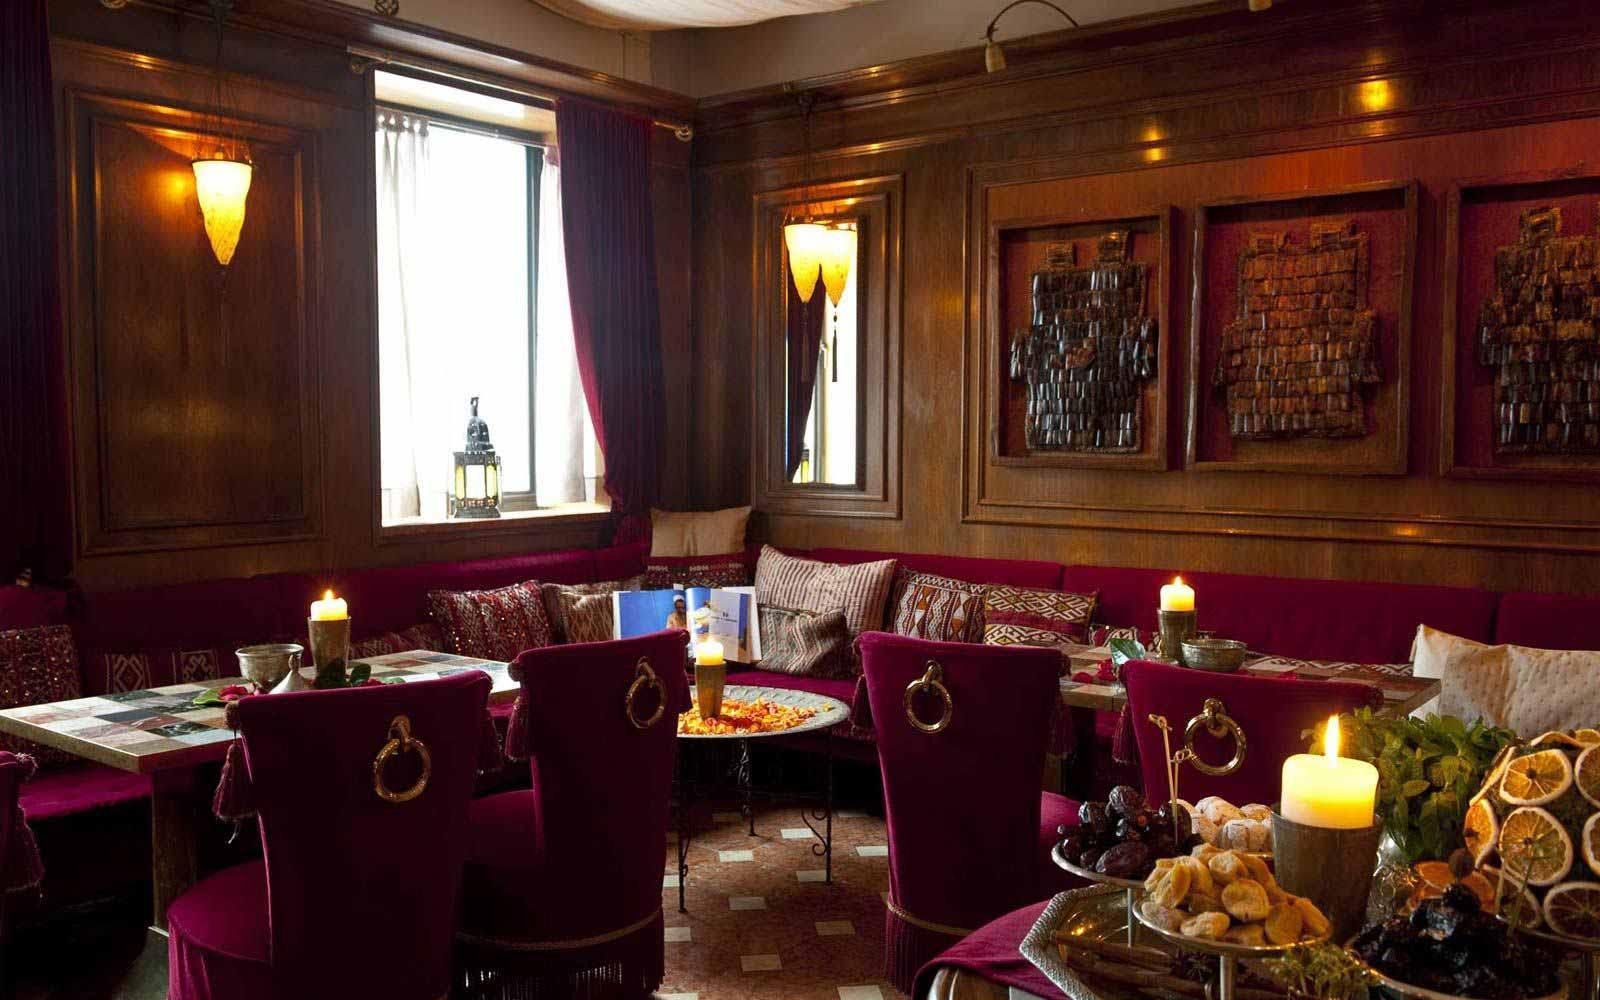 The Oriental bar at Hotel Metropole